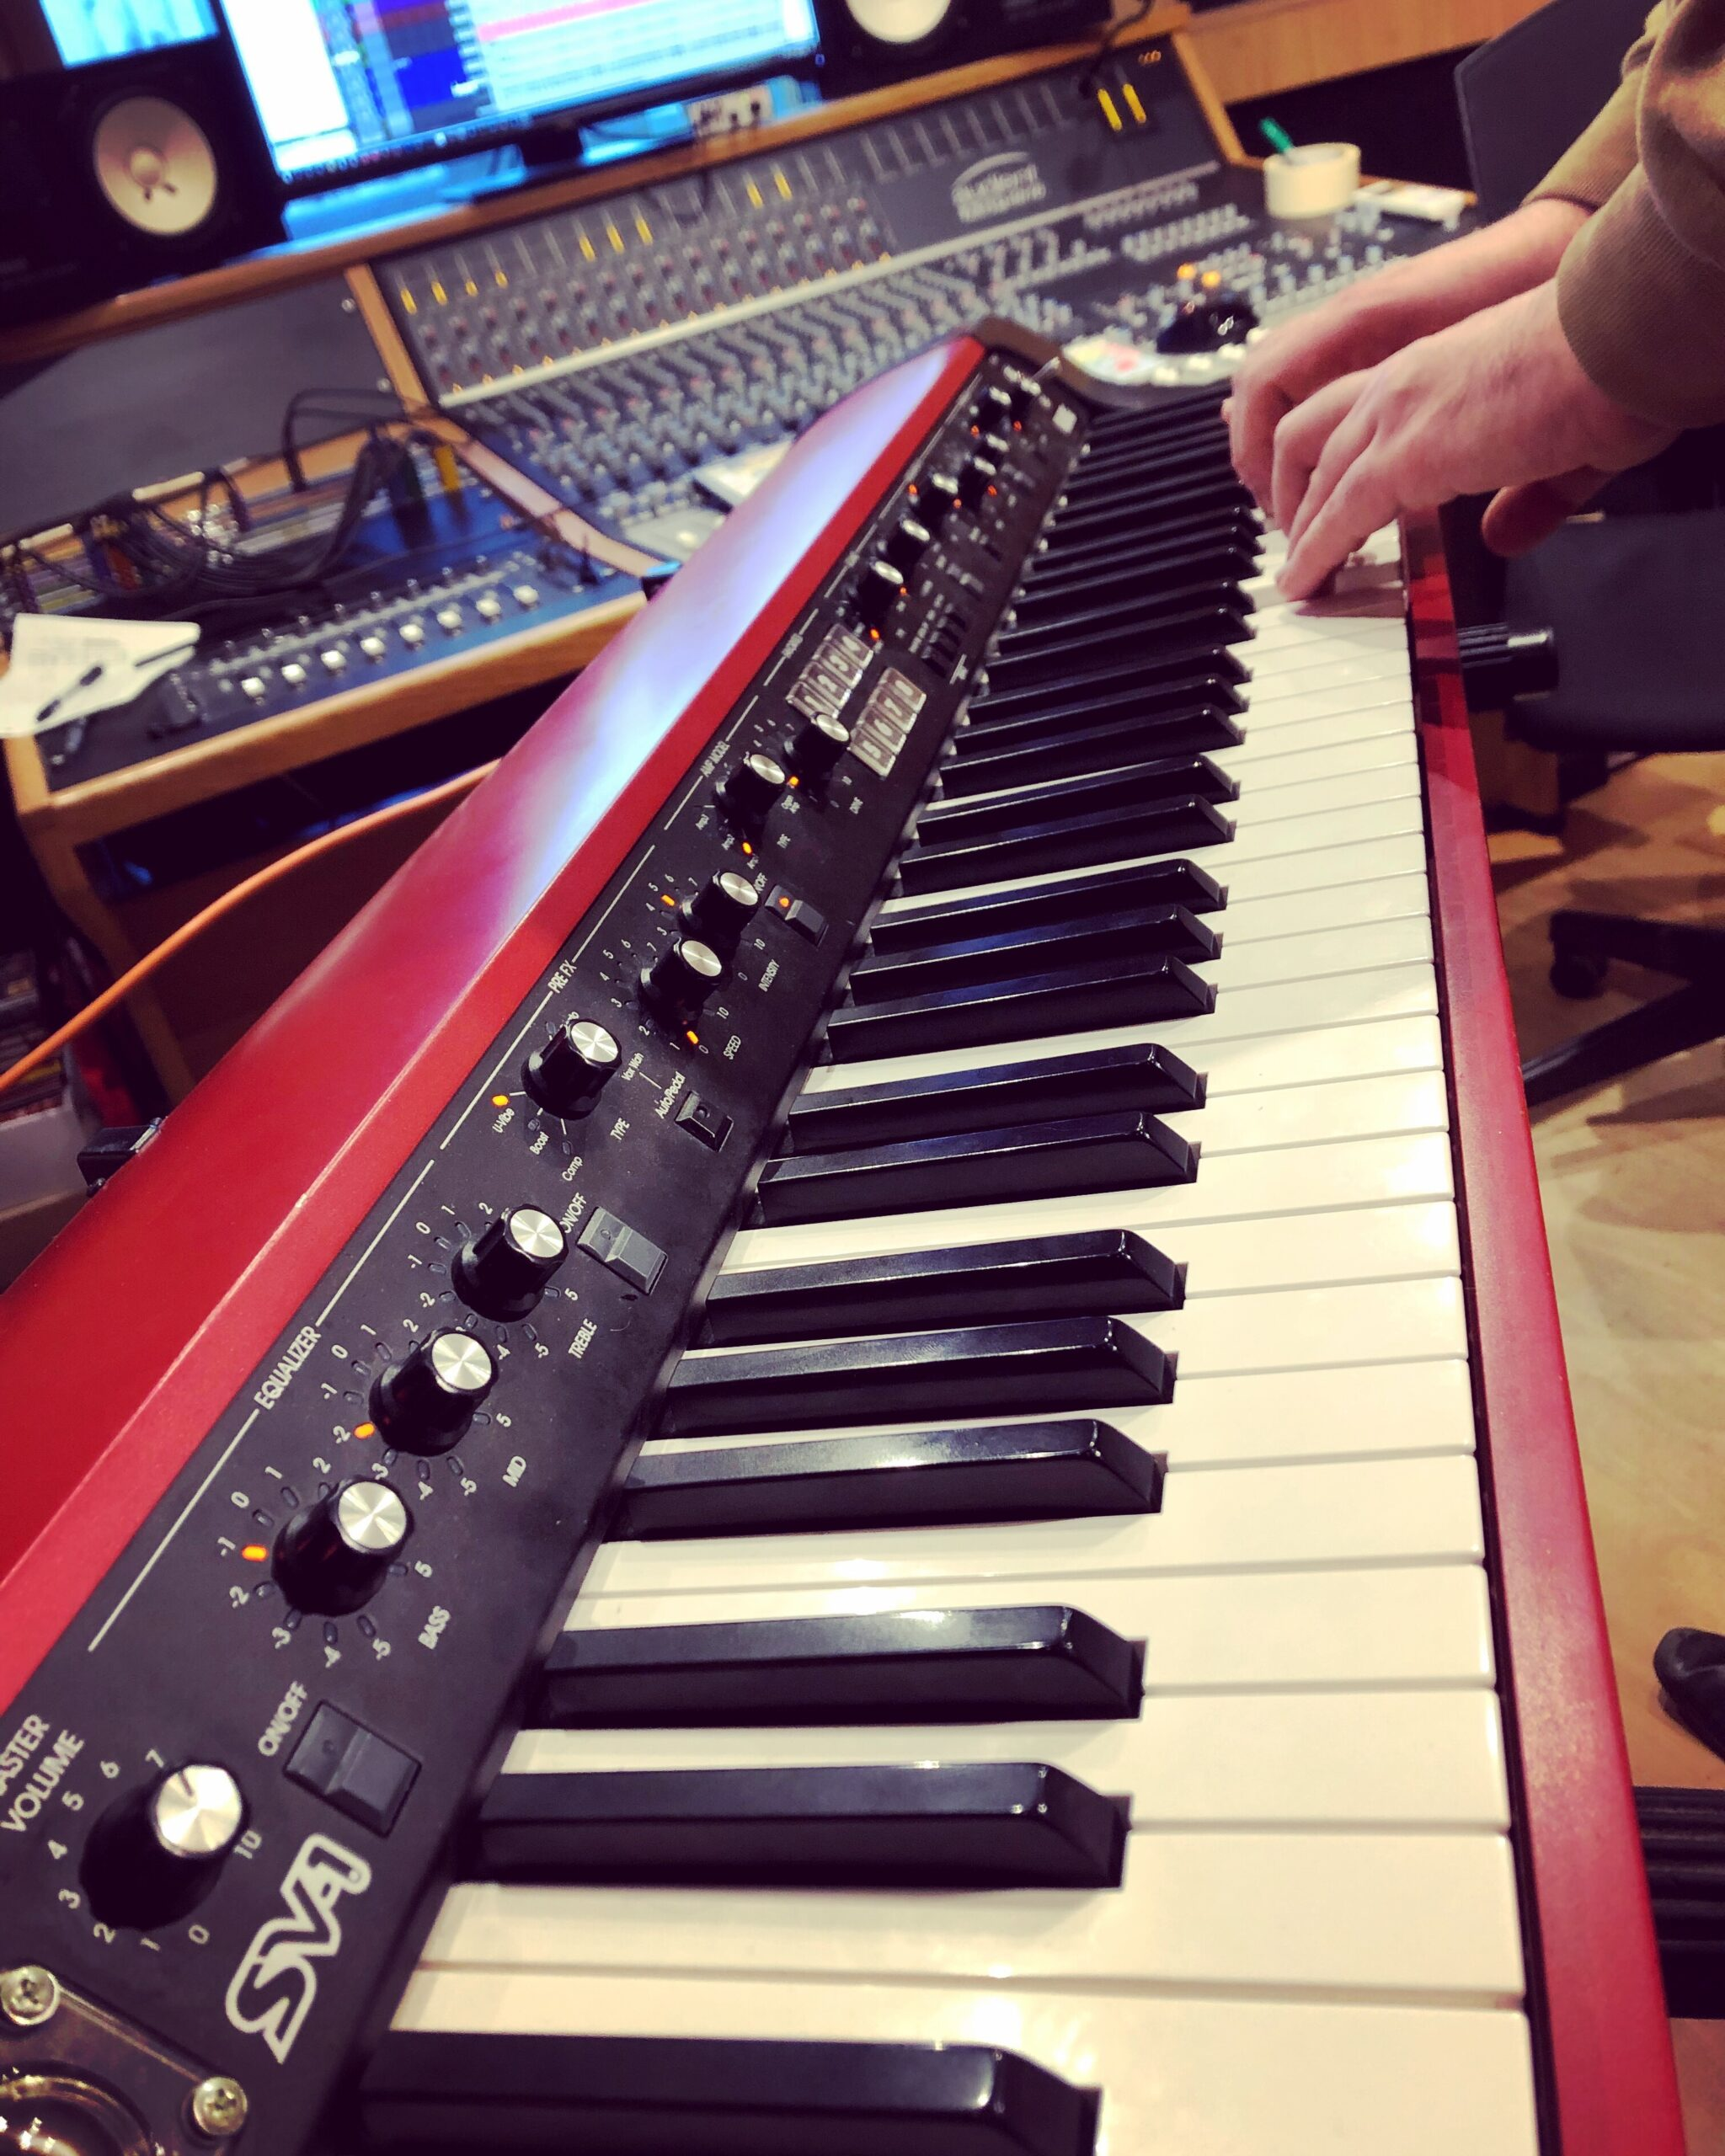 Slipway-Studio_Keyboard-Recording_Korg-SV-1